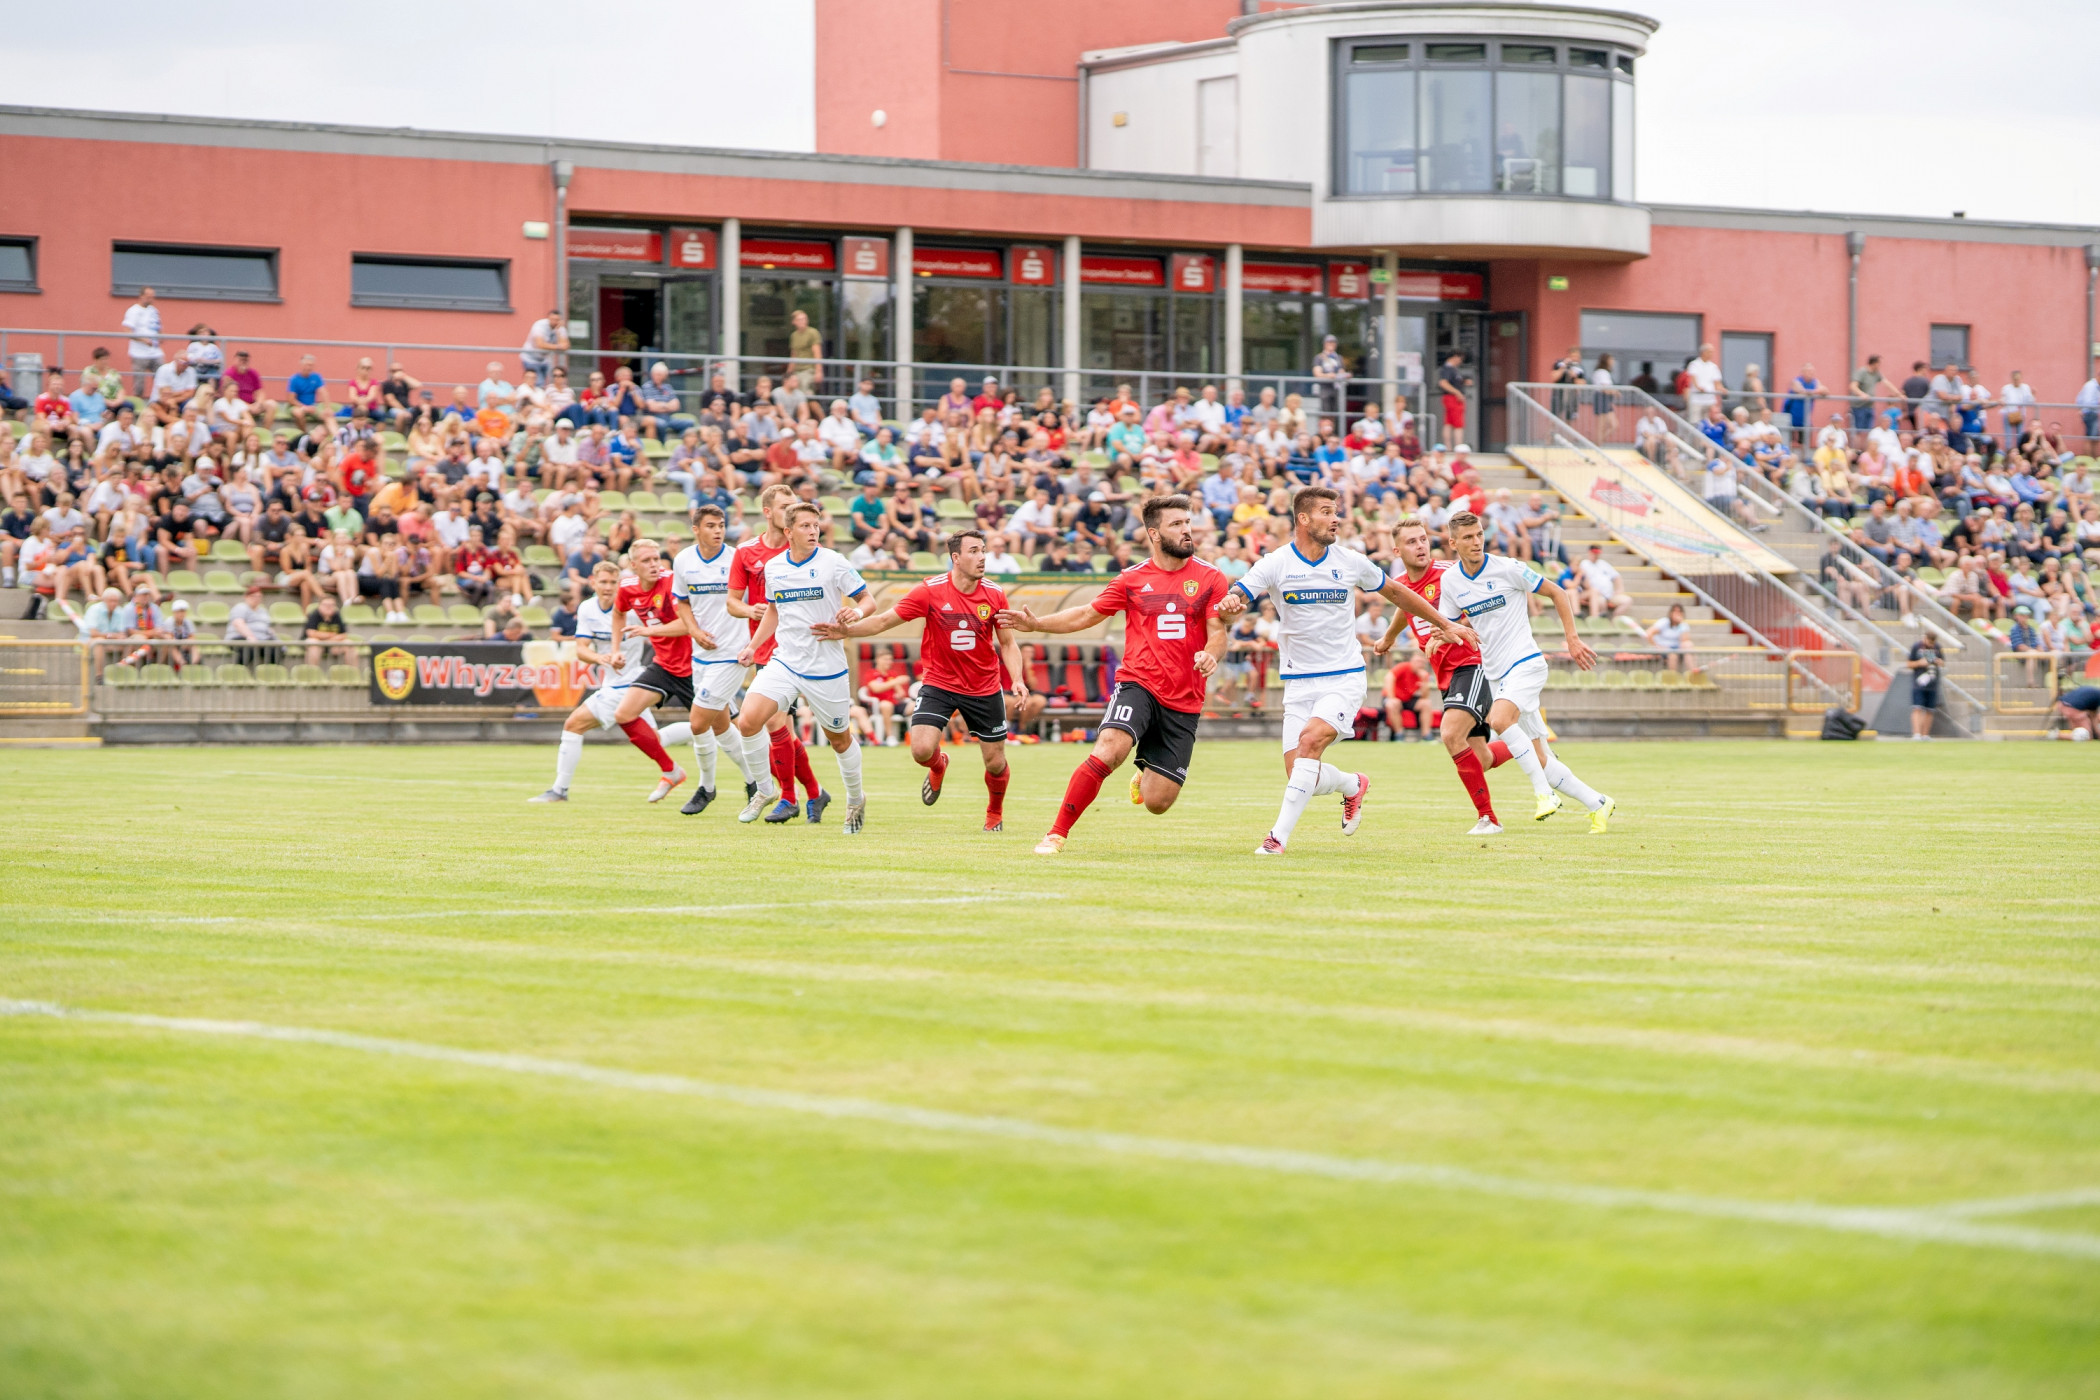 #ErsteMänner ► Test gegen 1. FCM - 1. FC Lok Stendal